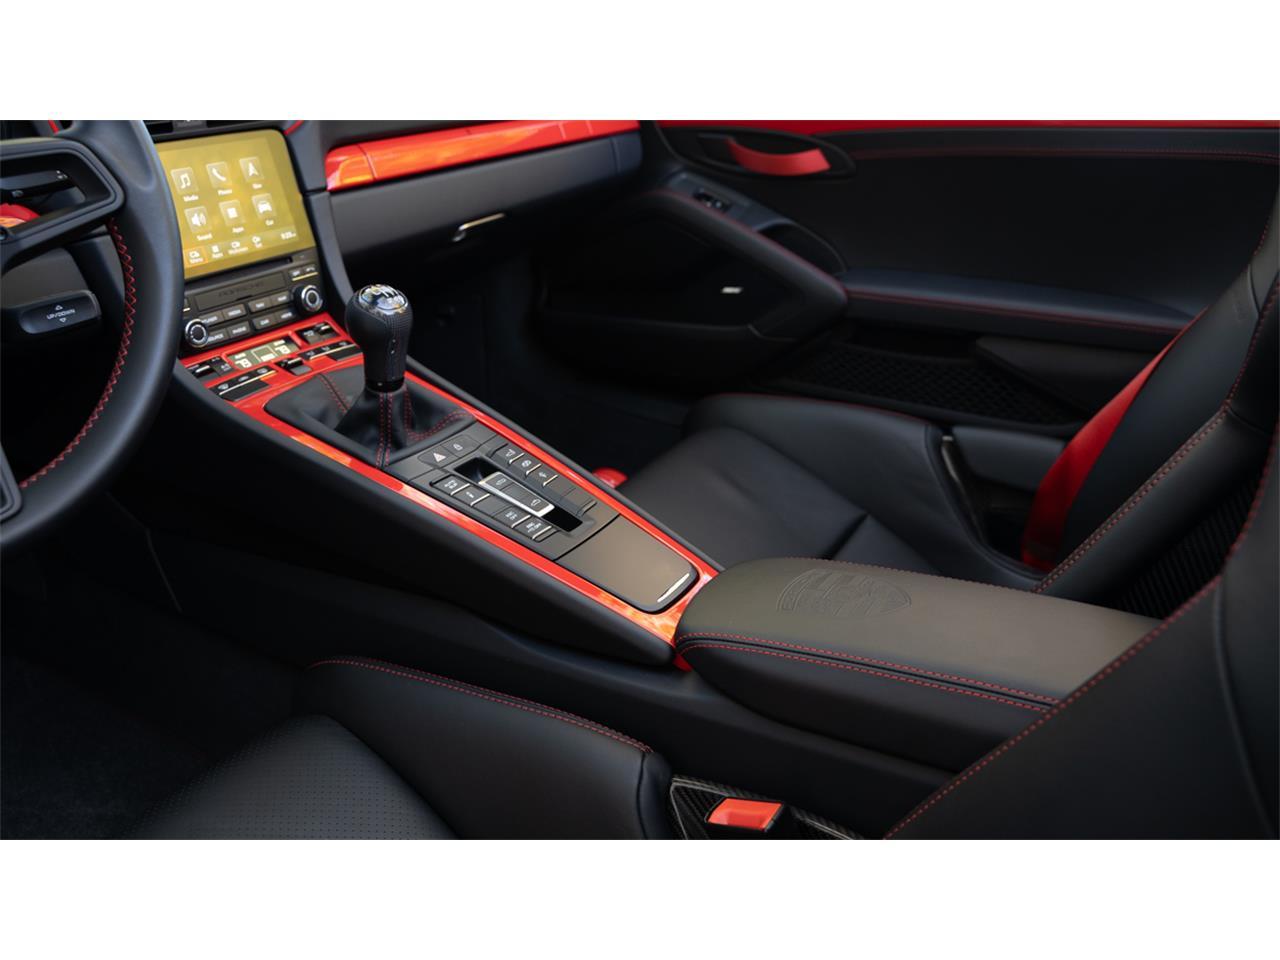 2019 Porsche Speedster (CC-1415985) for sale in Salt Lake City, Utah